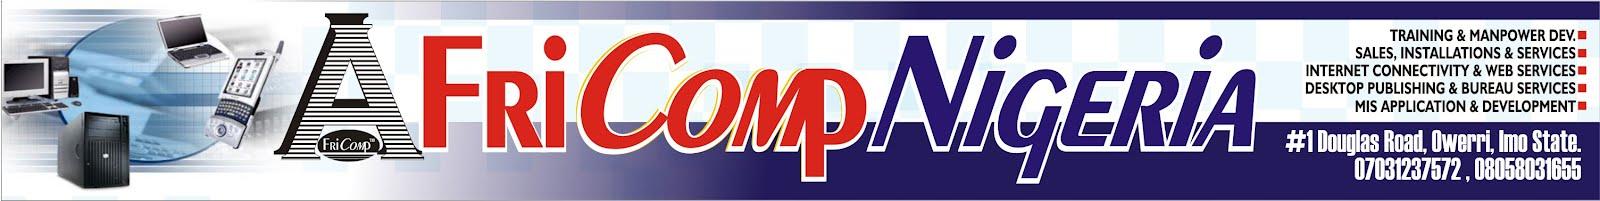 AfriComp Nigeria Blog Site